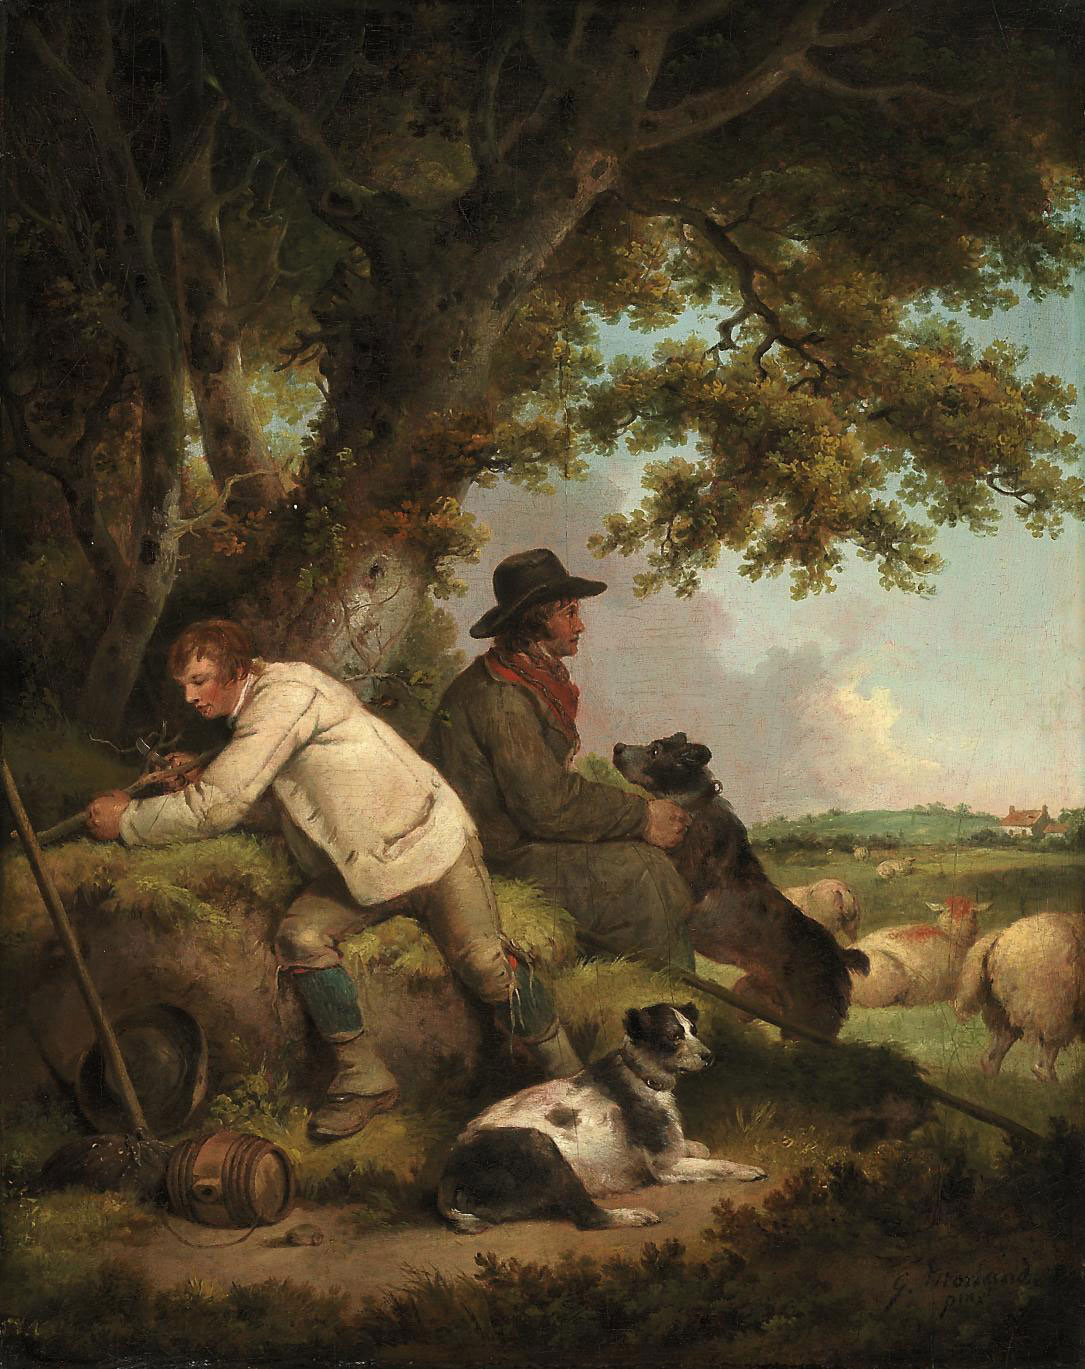 Shepherds reposing